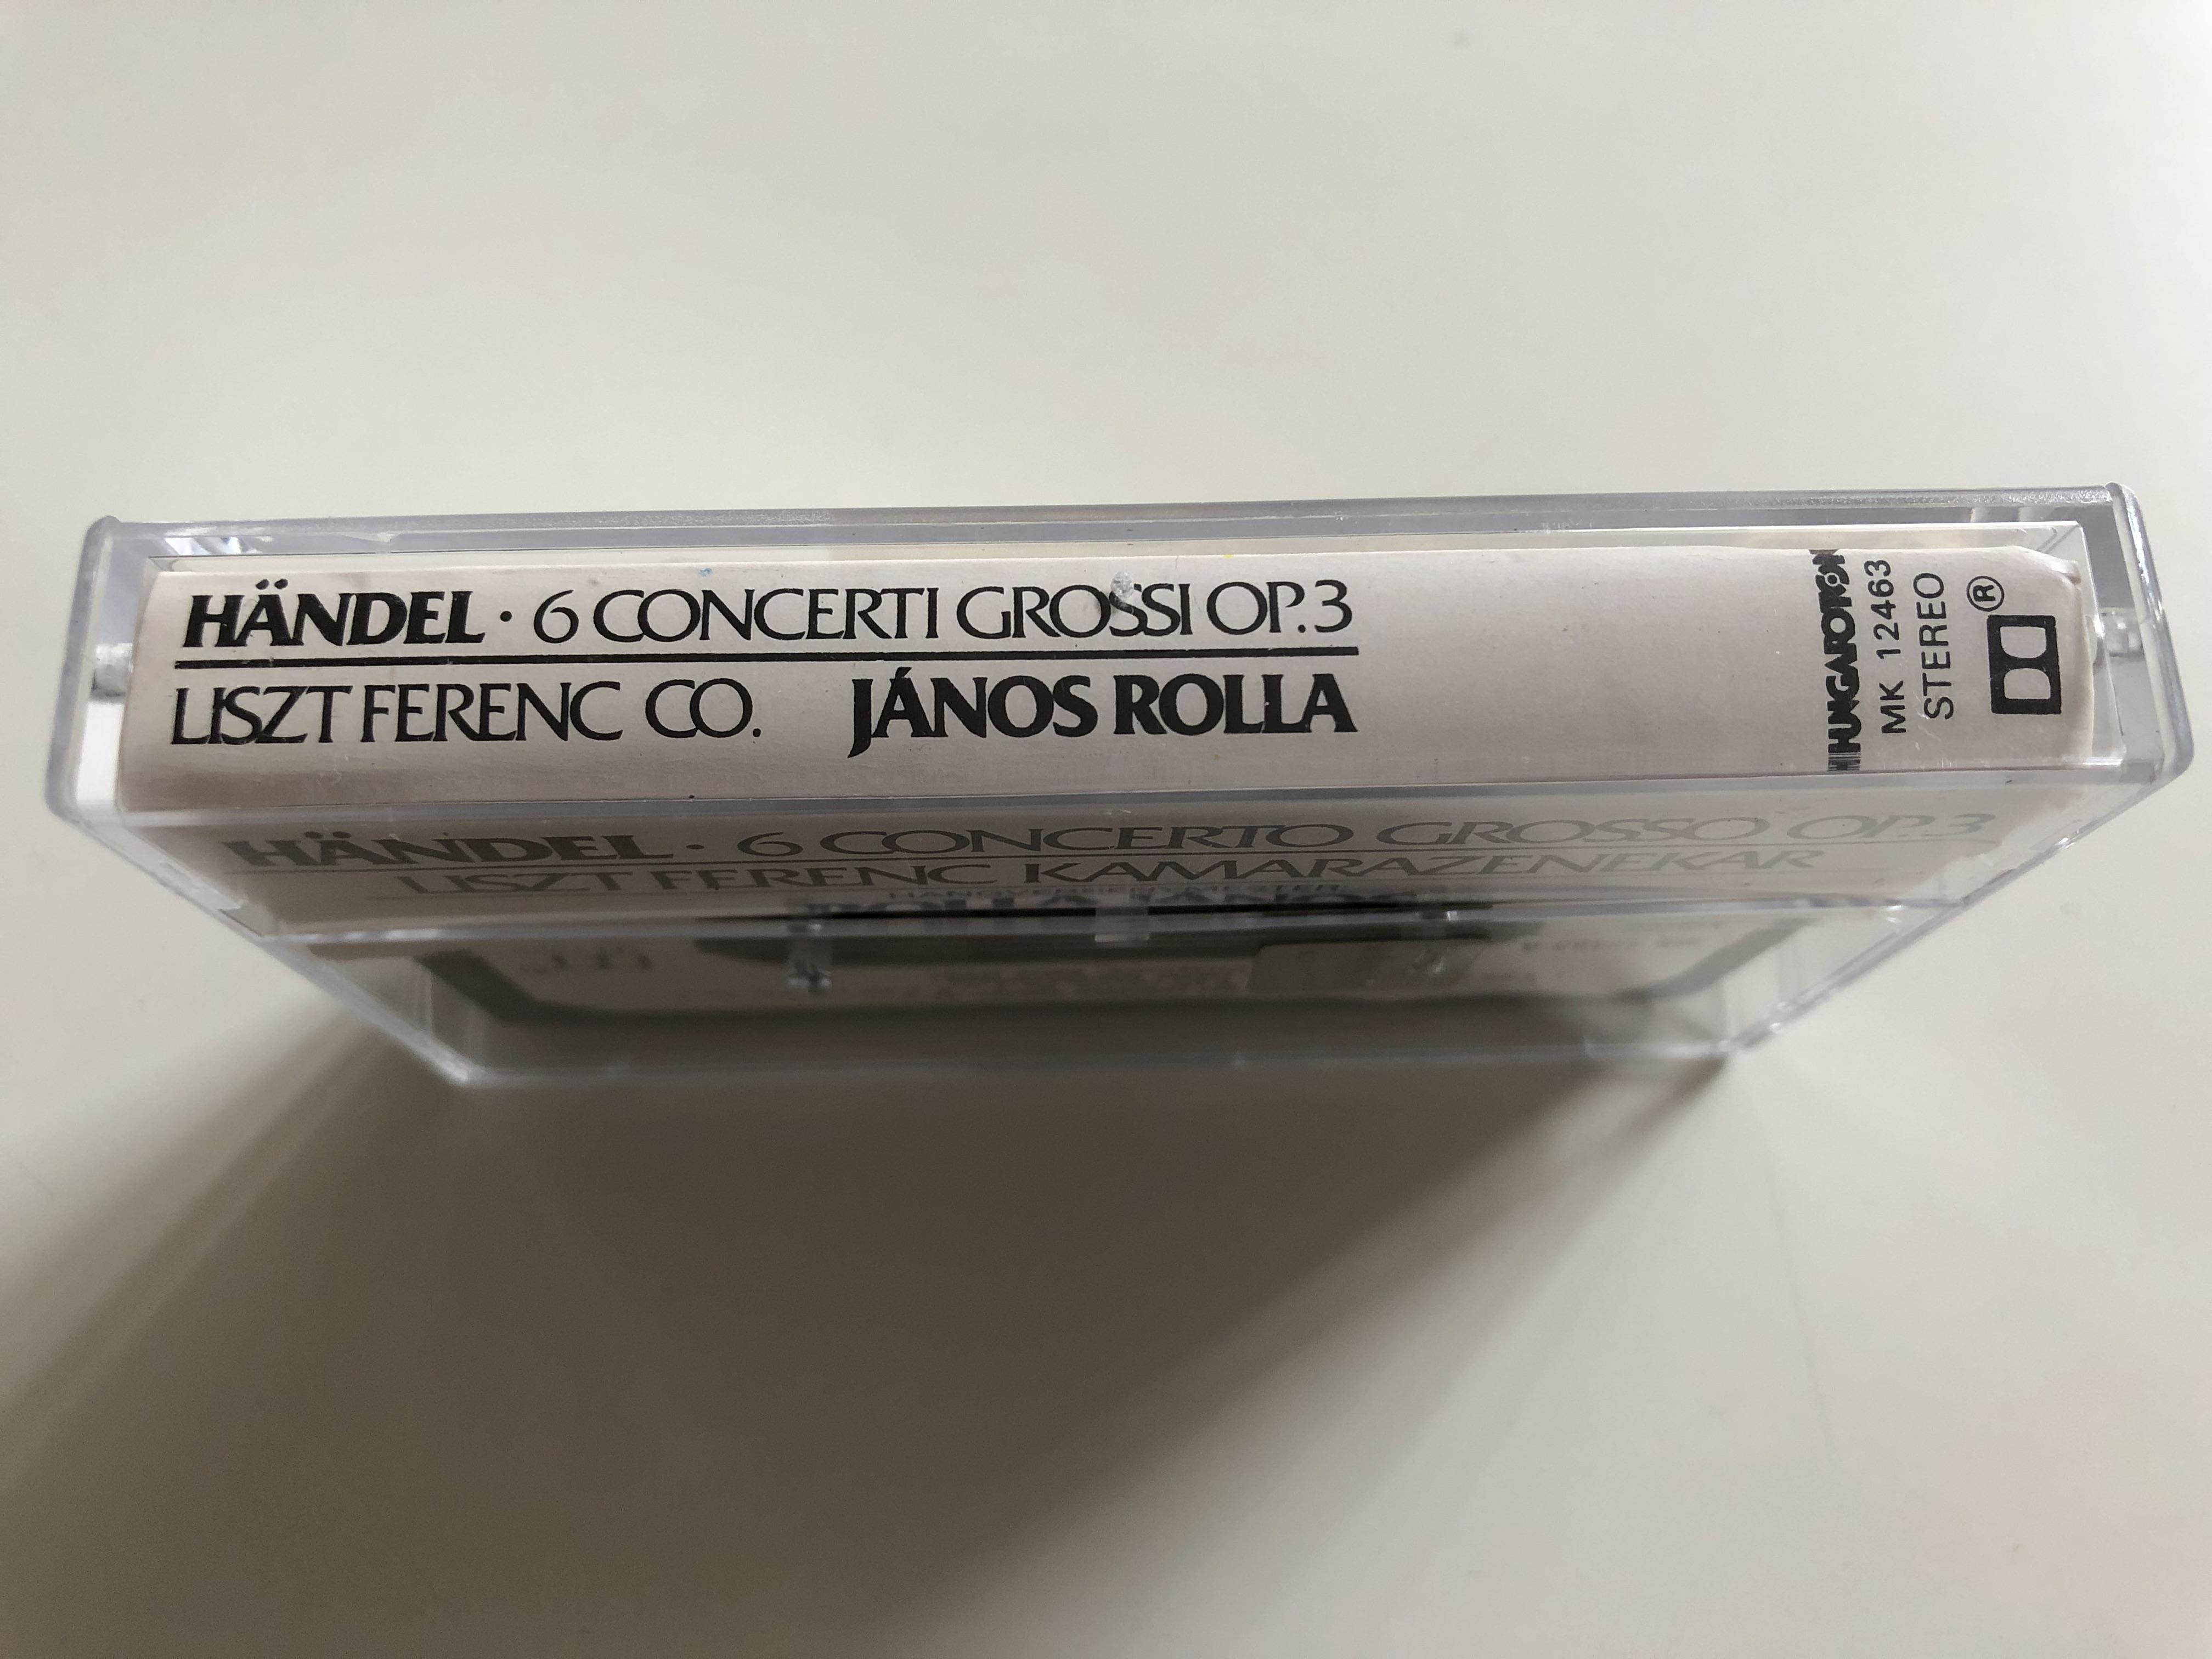 handel-6-concerti-grossi-op.-3-liszt-ferenc-chamber-orchestra-budapest-directed-by-j-nos-rolla-hungaroton-cassette-stereo-mk-12463-4-.jpg